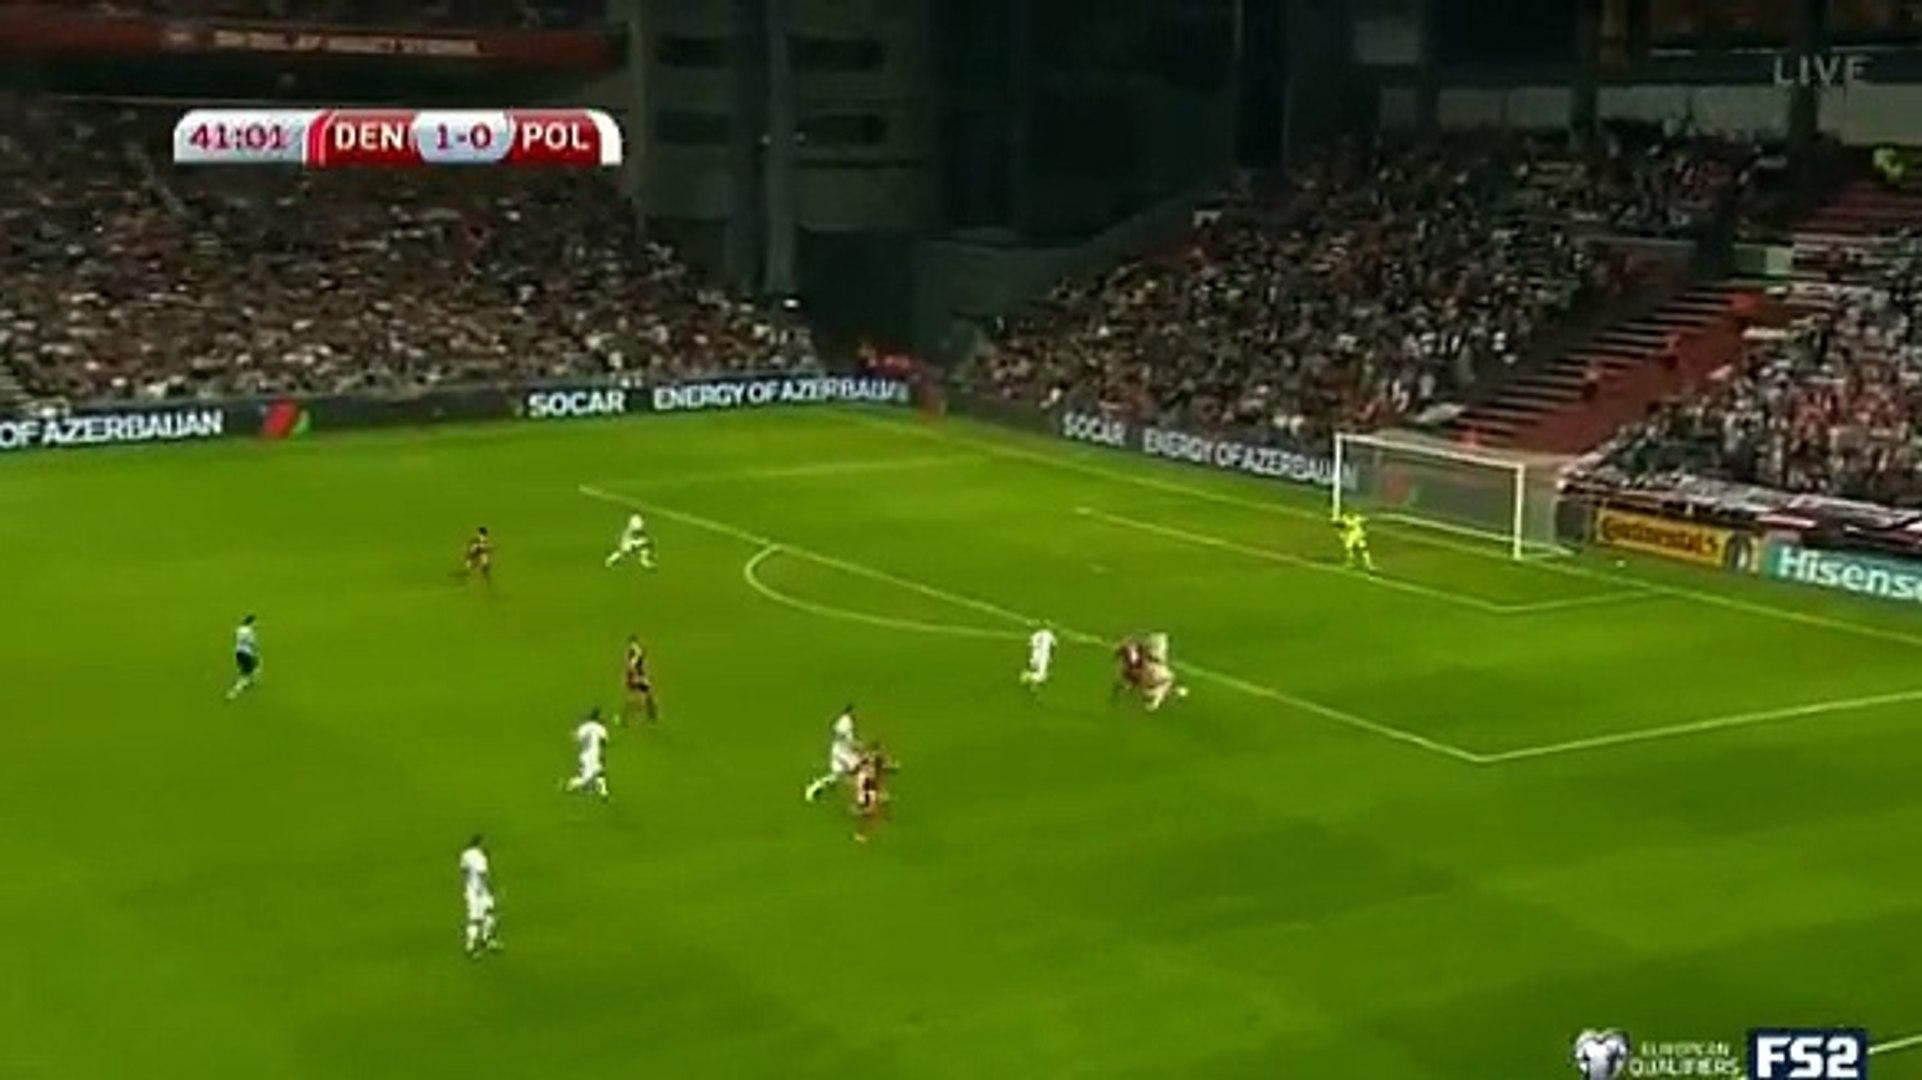 Андреас Корнелиус Гол HD - Дания 2-0 Польша 01.09.2017